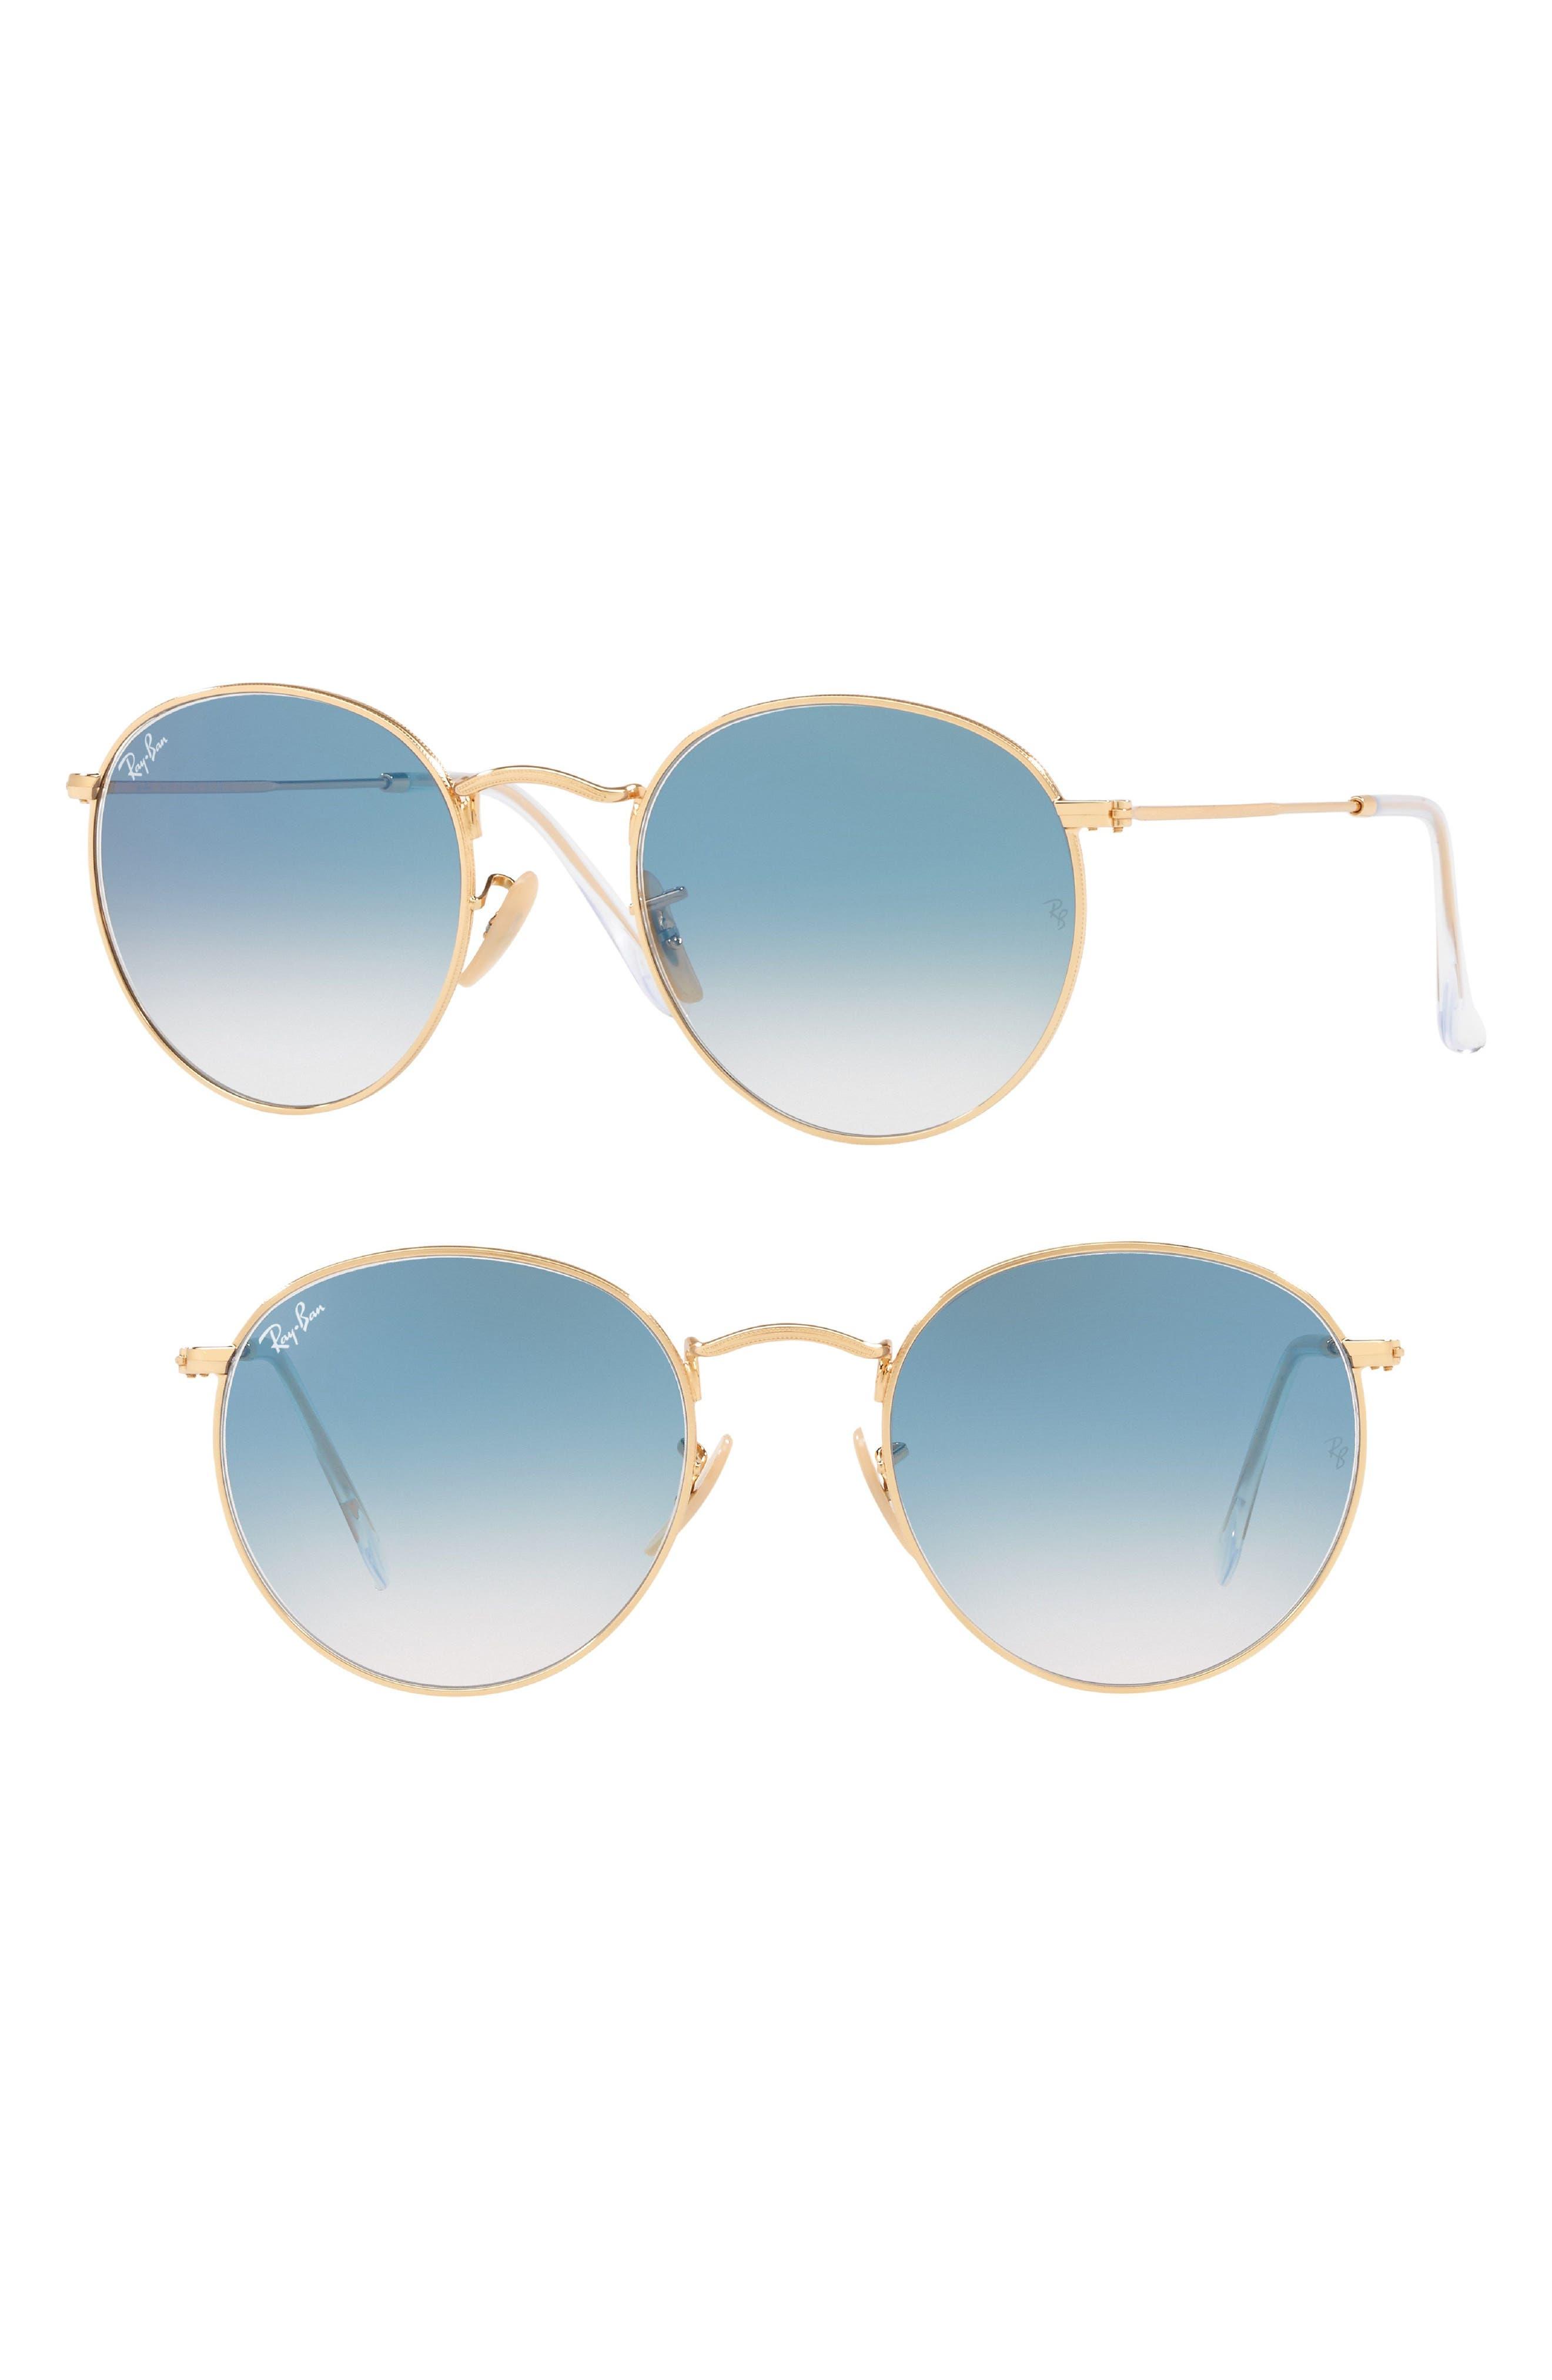 53mm Round Retro Sunglasses,                         Main,                         color, Gold